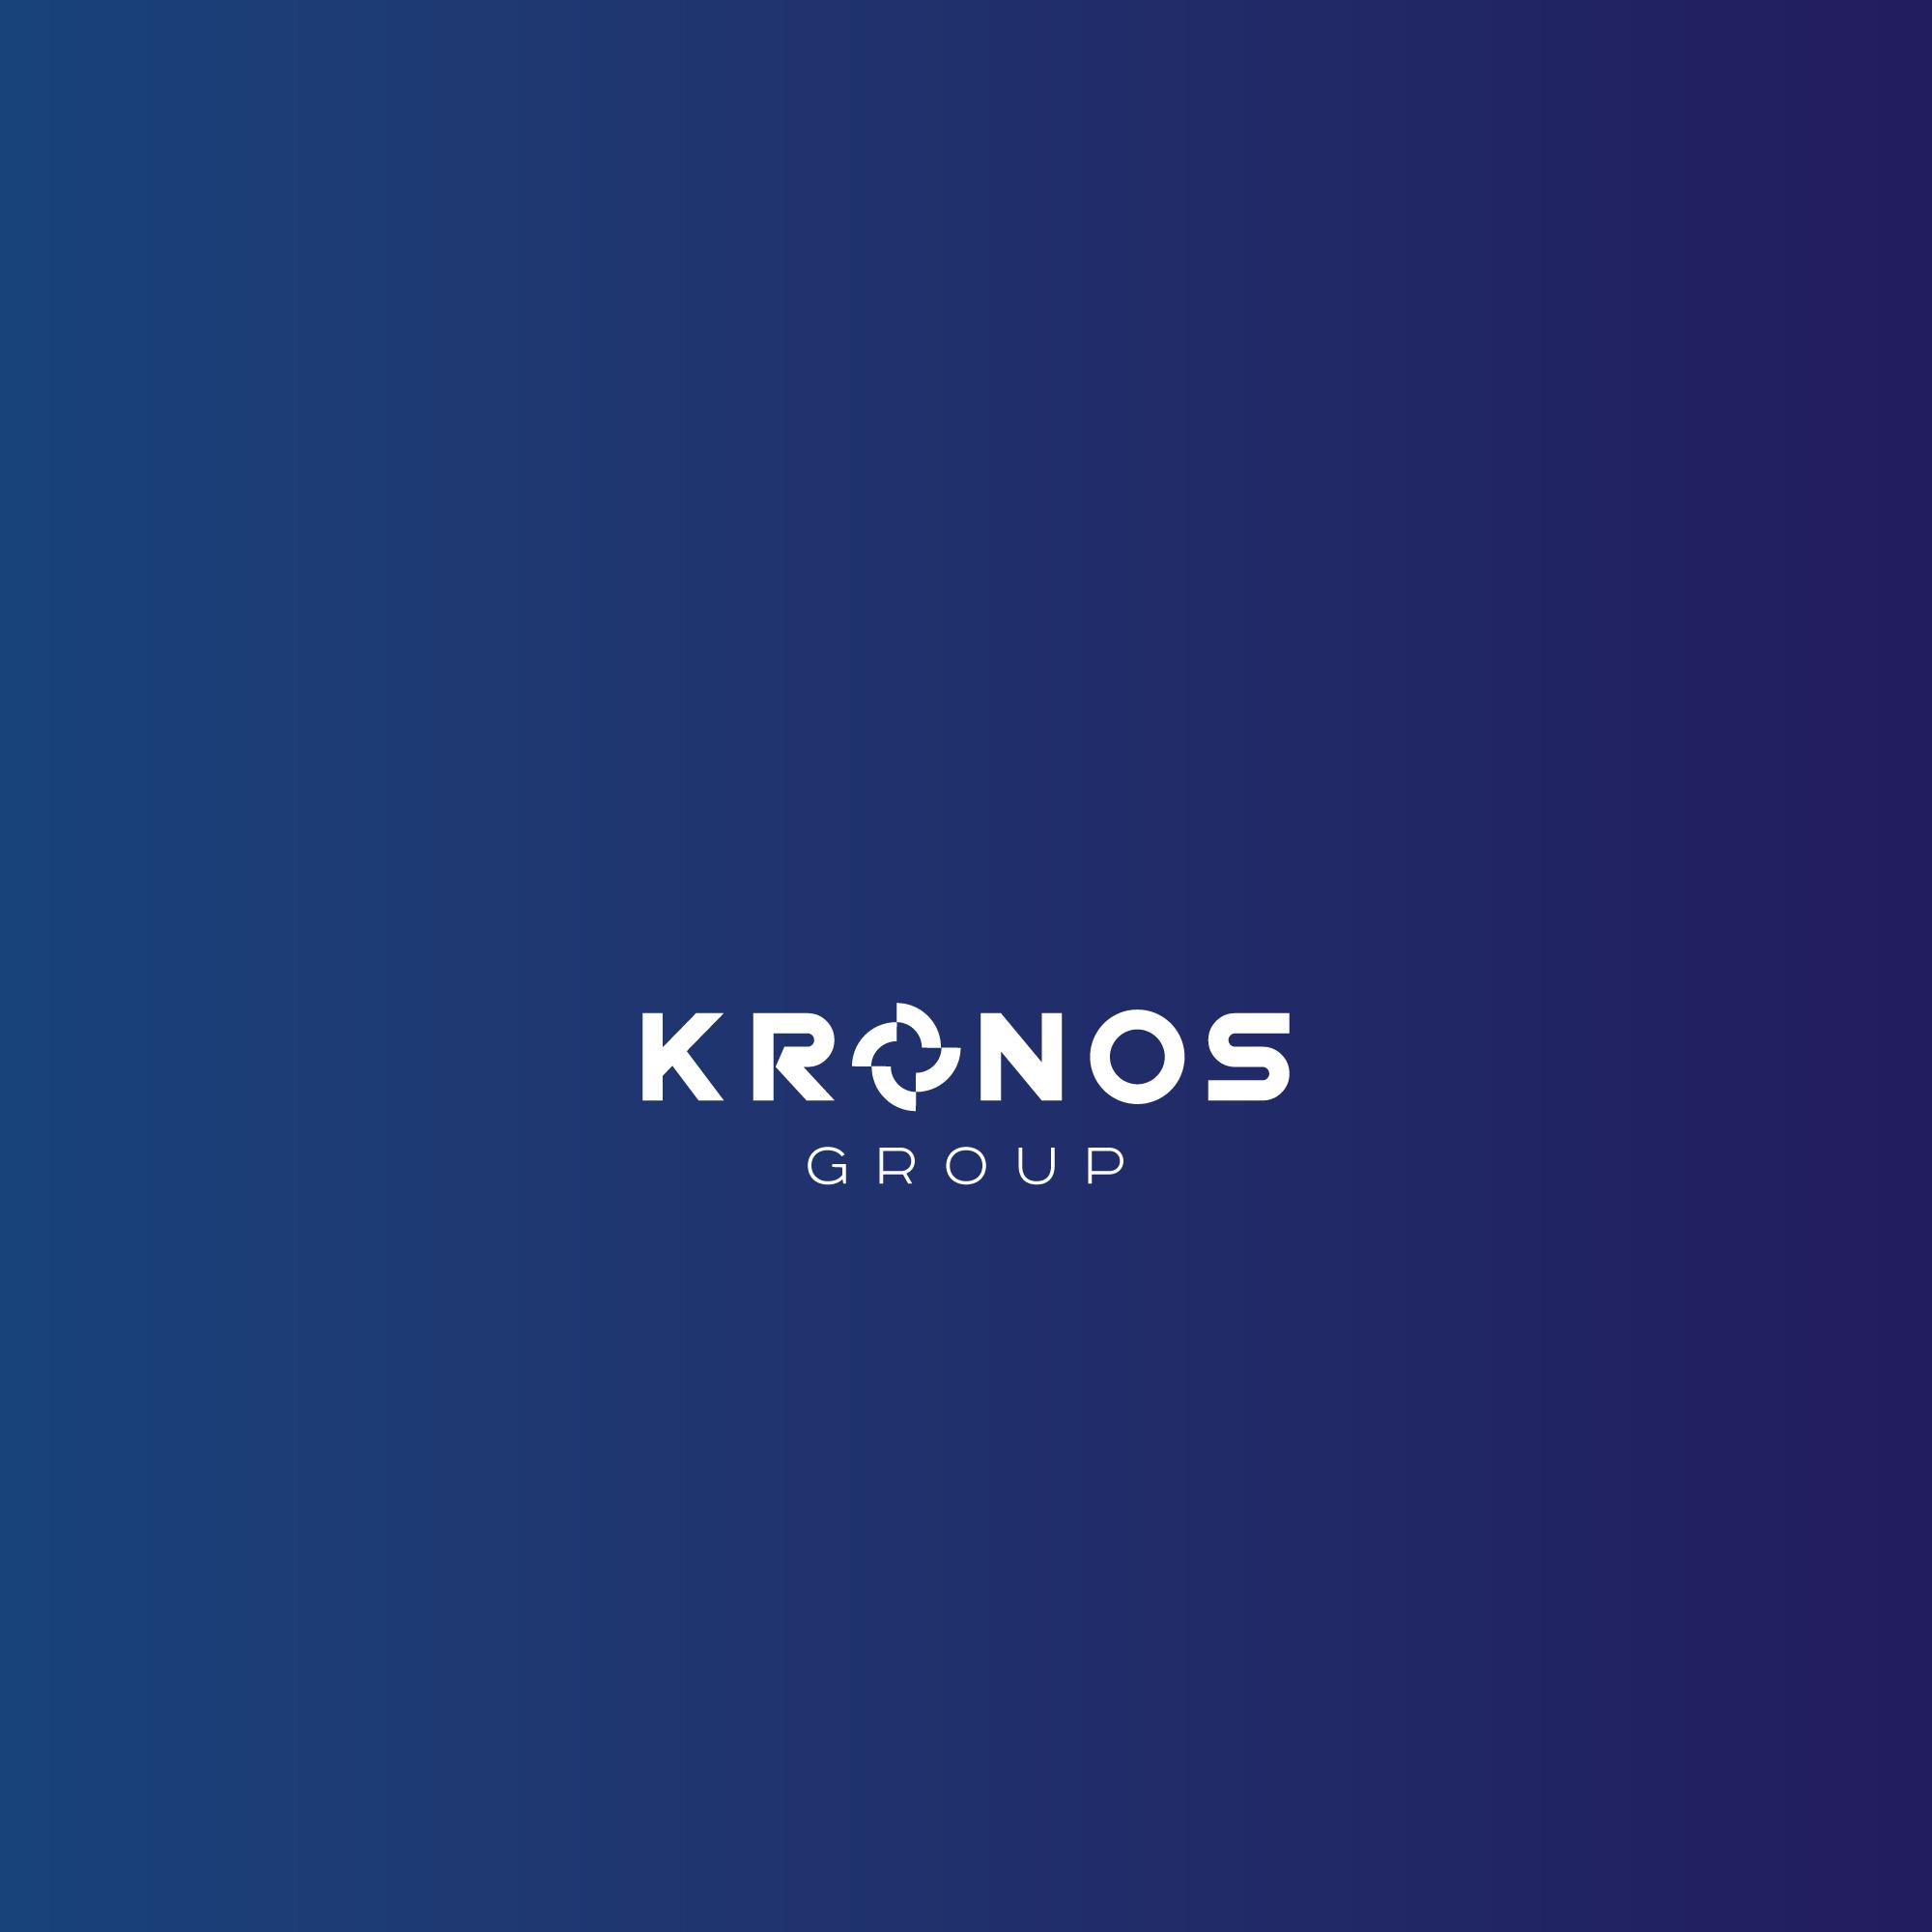 Разработать логотип KRONOS фото f_3415faf10cc17f46.jpg